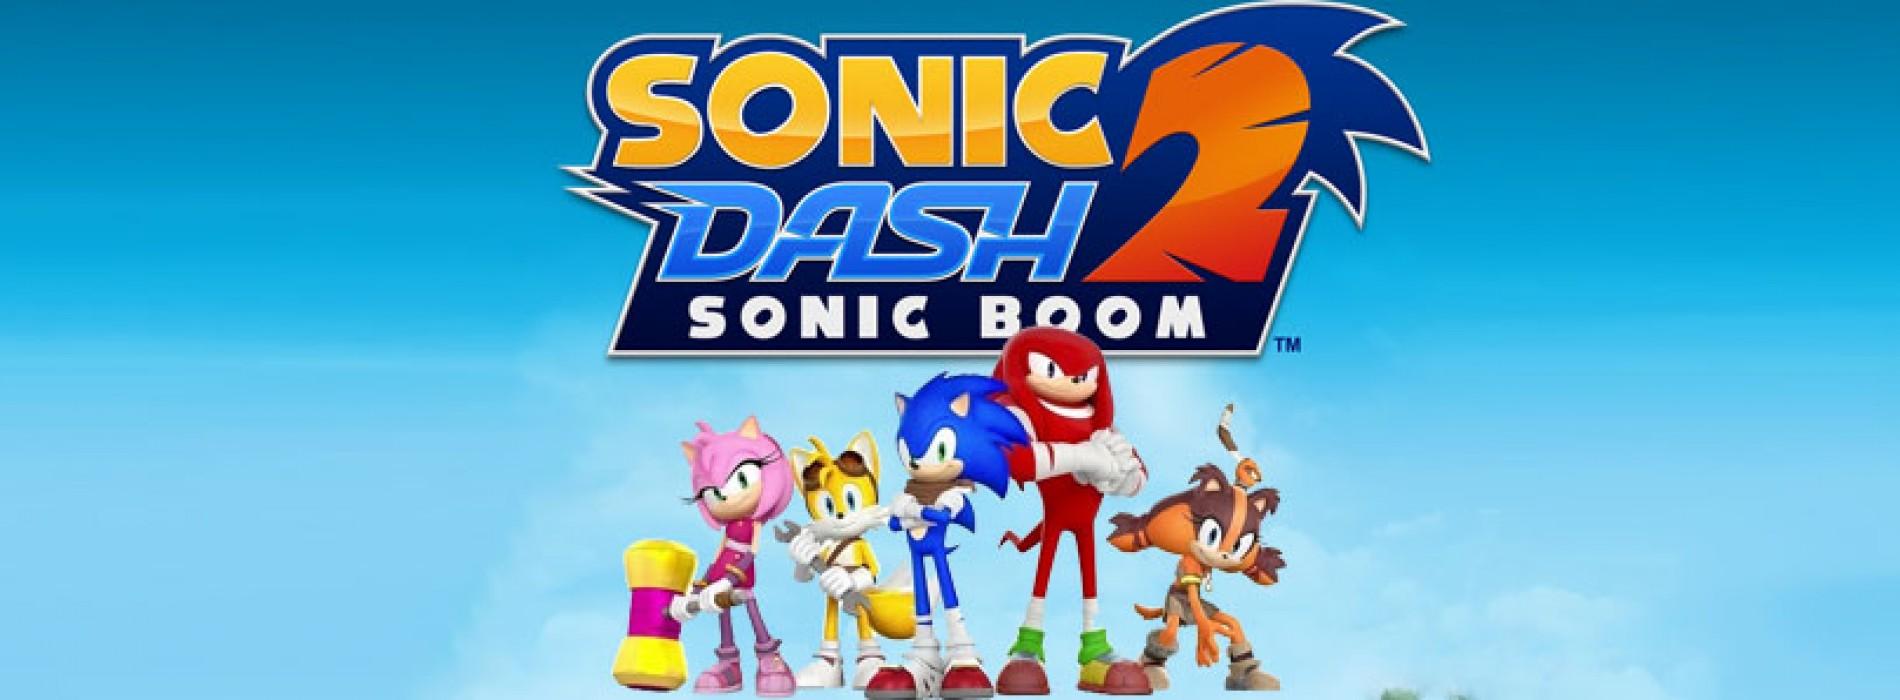 Herní novinka Sonic Dash 2: Sonic Boom [Android]